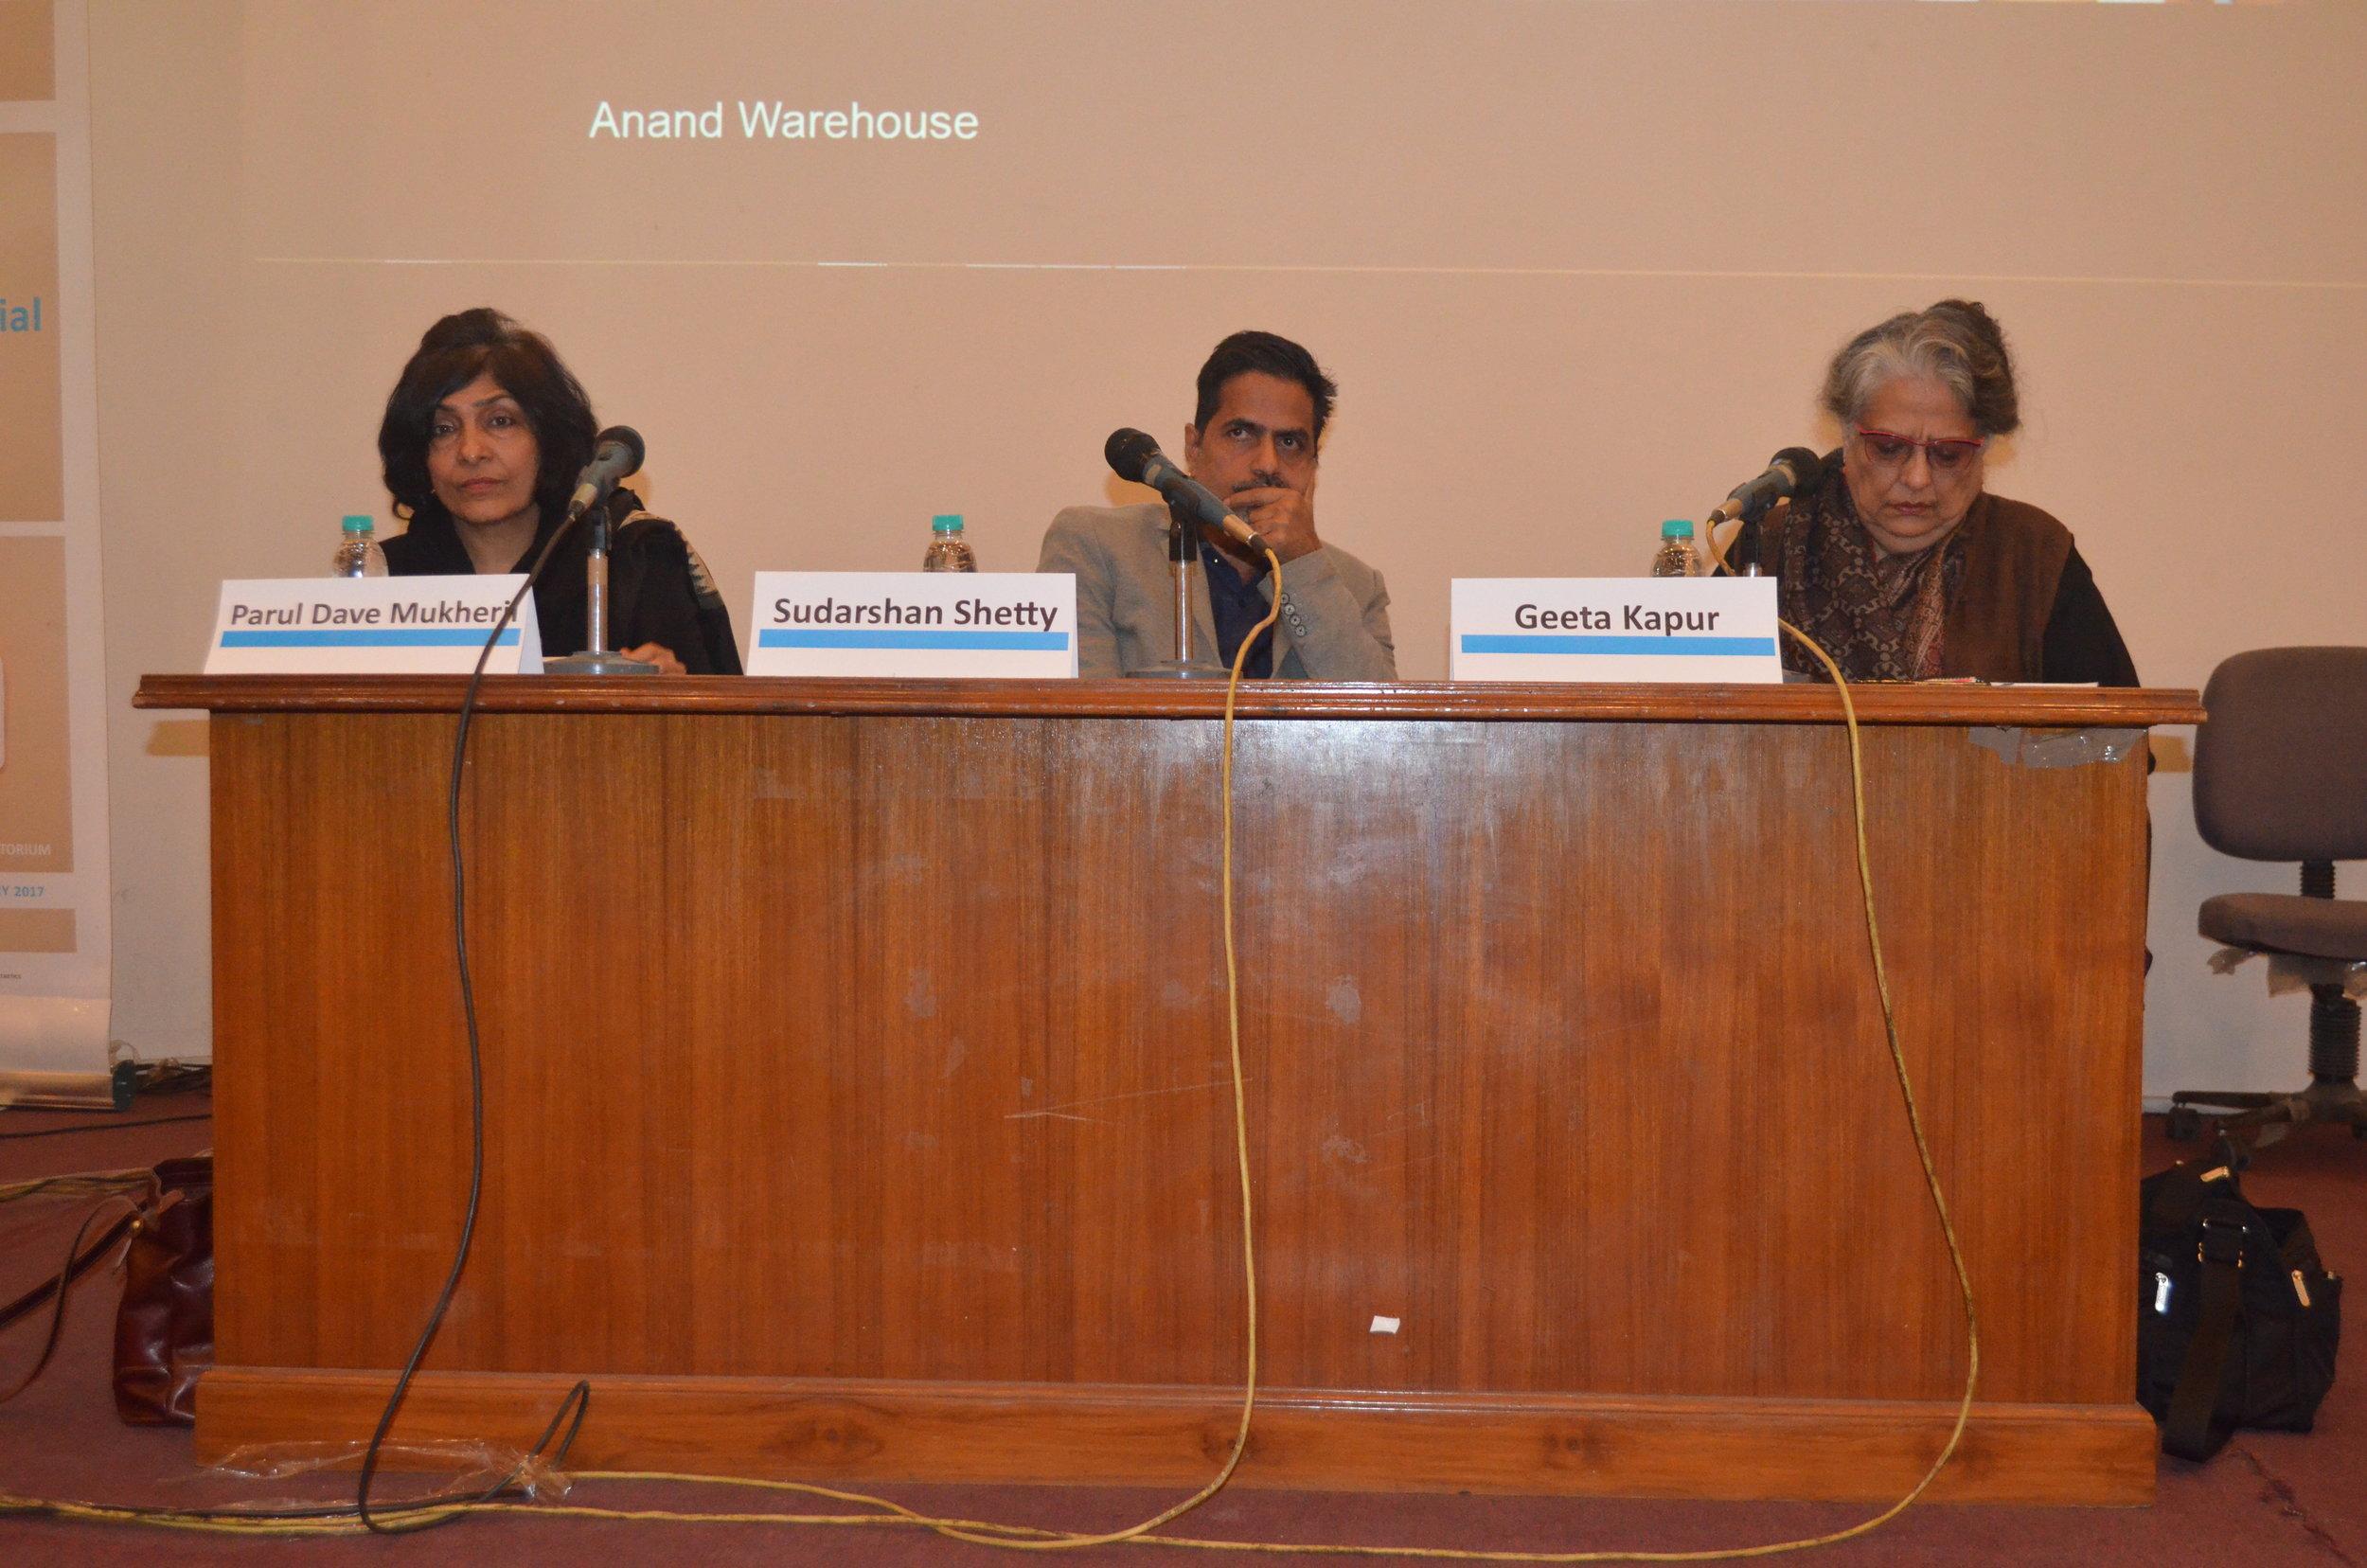 Kochi Muziris Biennale 2016 with Sudarshan Shetty,Parul Dave Mukherji and Geeta Kapur.